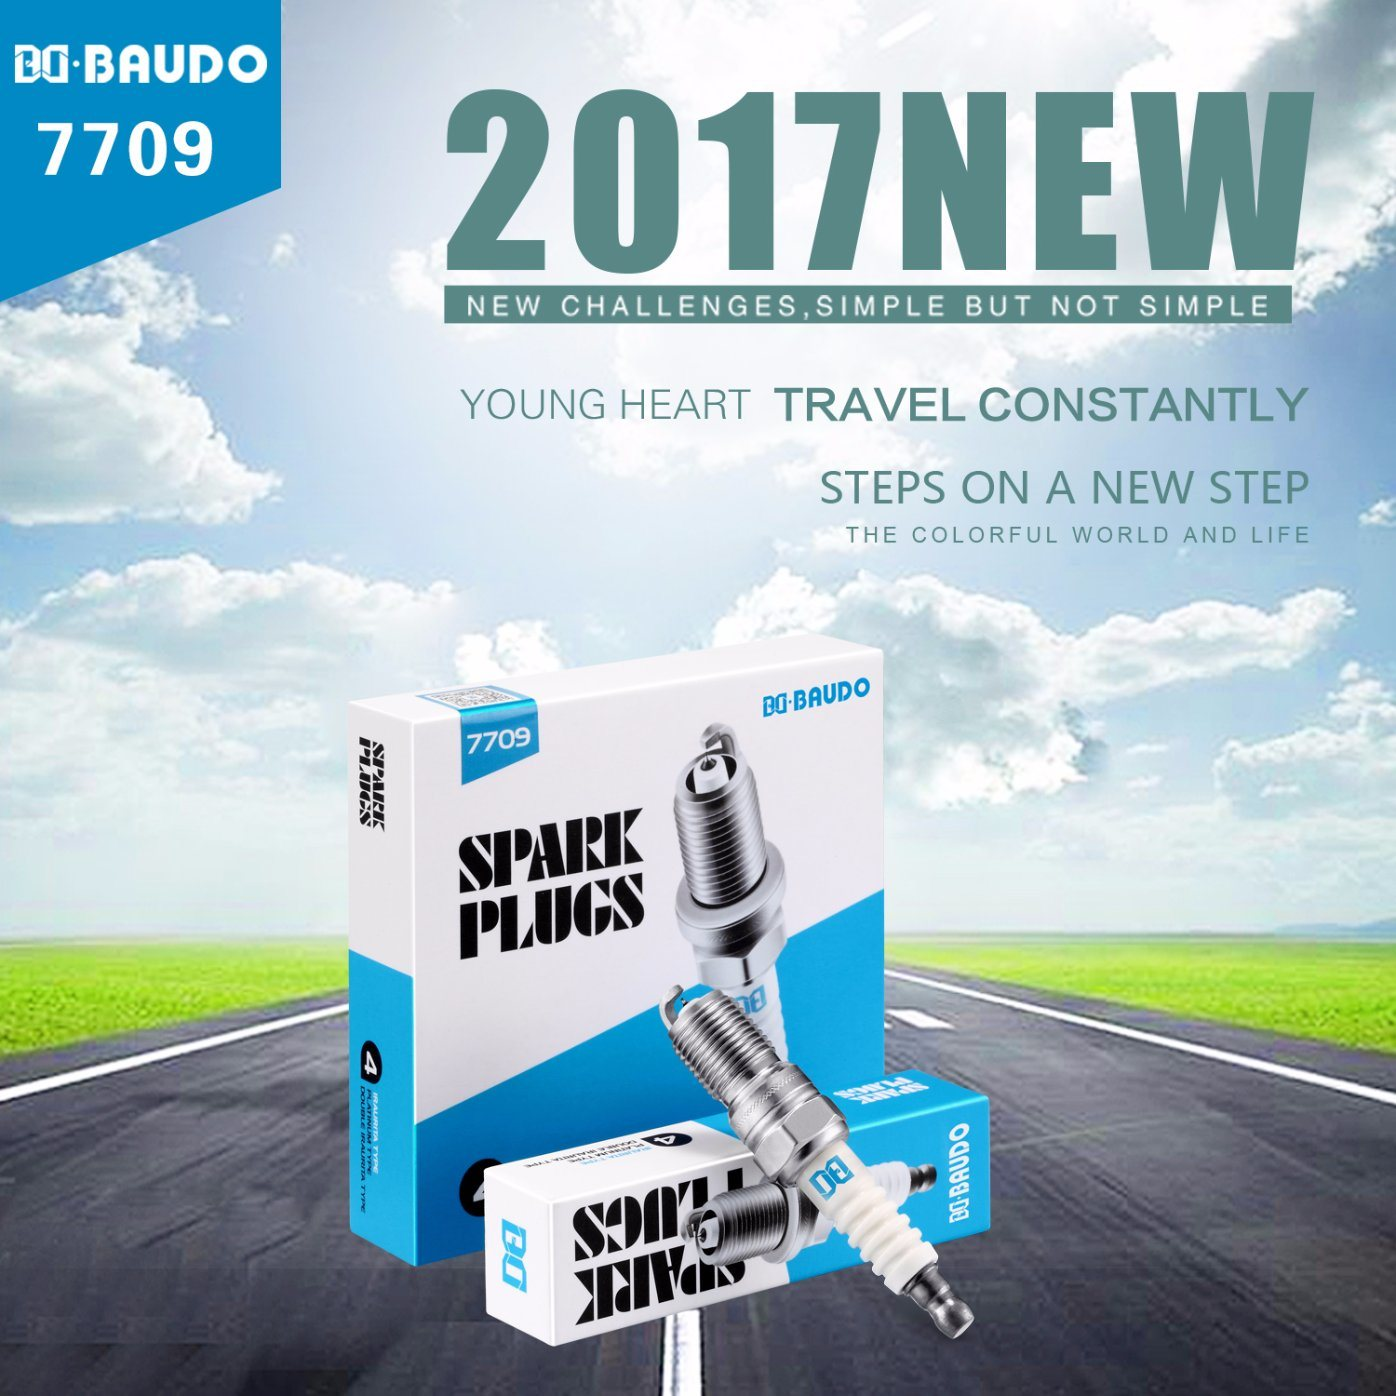 Bd 7709 Iridium Spark Plug Fuel Saving Ignition System Replace Original Ngk Itr6f-13